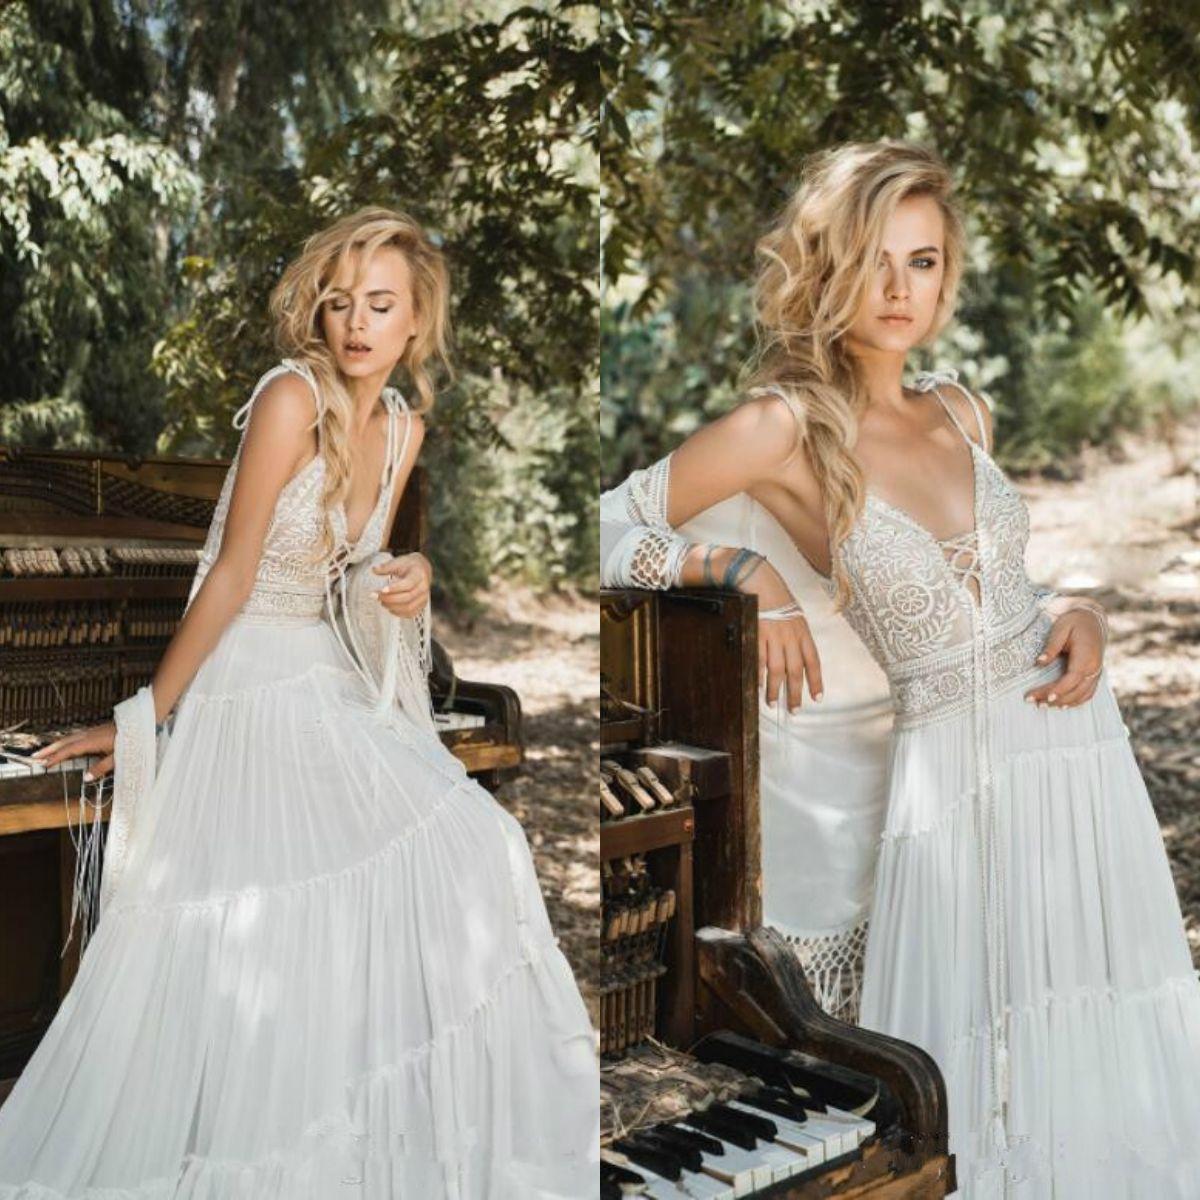 Inbal Raviv Bohemian Beach Wedding Dresses with Wrap Jacket Modest Spaghetti V Neck Vintage Lace Chiffon Holiday Bridal Gowns Cheap